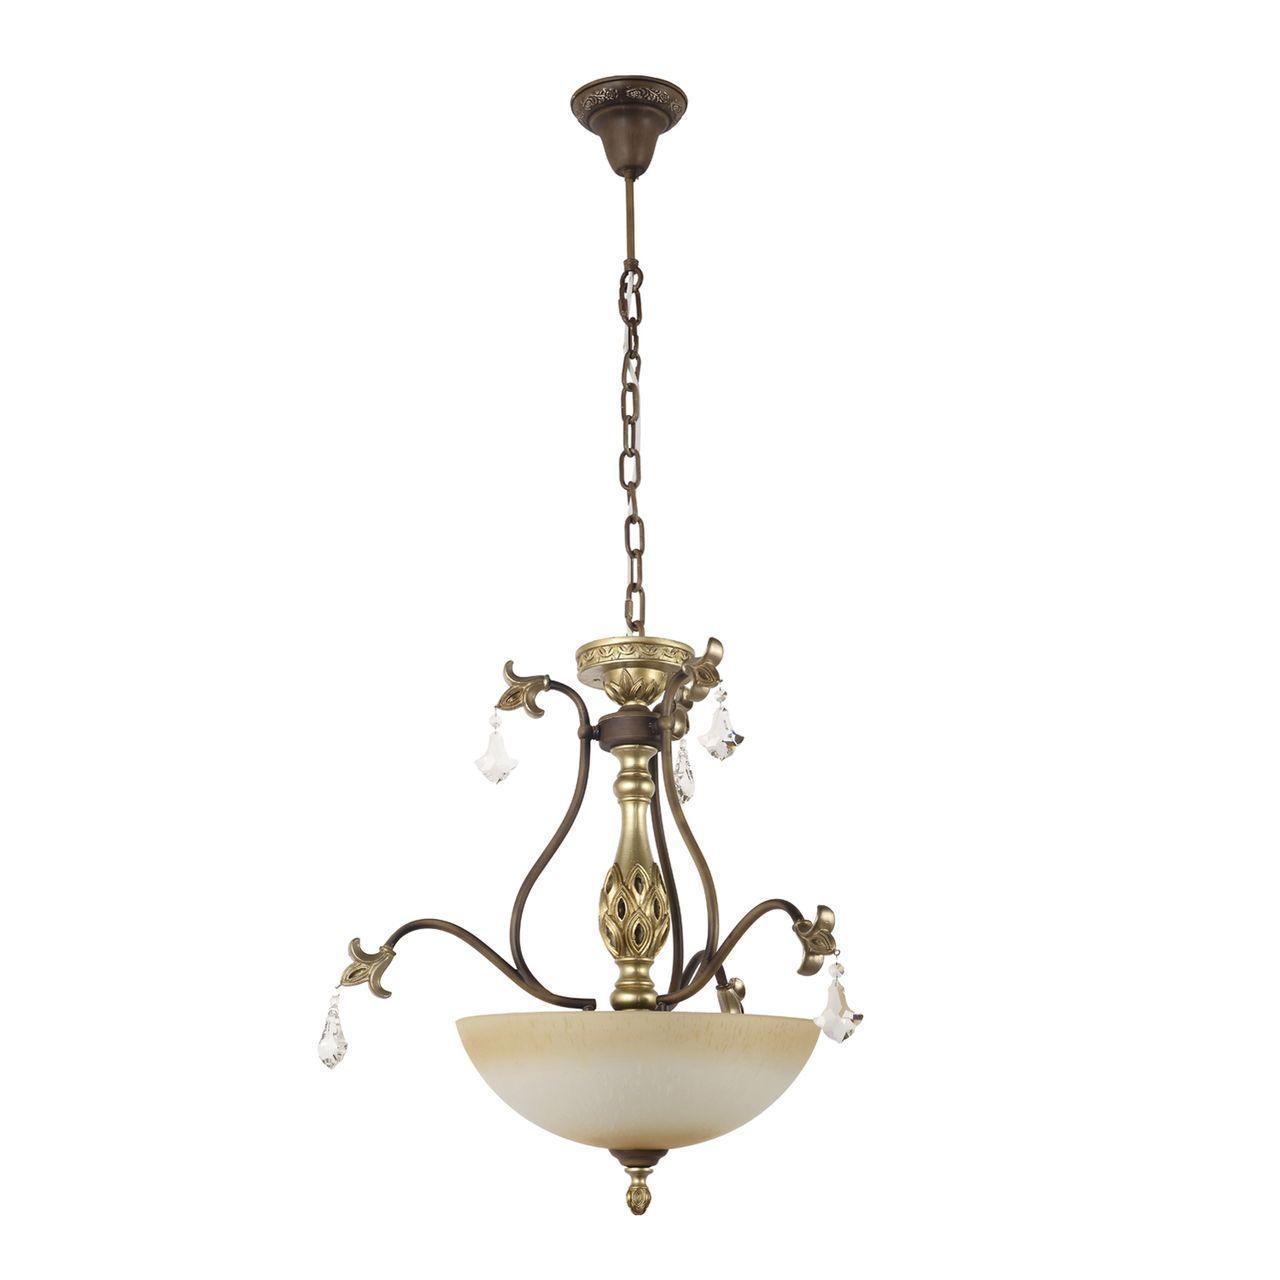 Подвесной светильник Dio DArte Asfour Dorato E 1.13.40.200 S